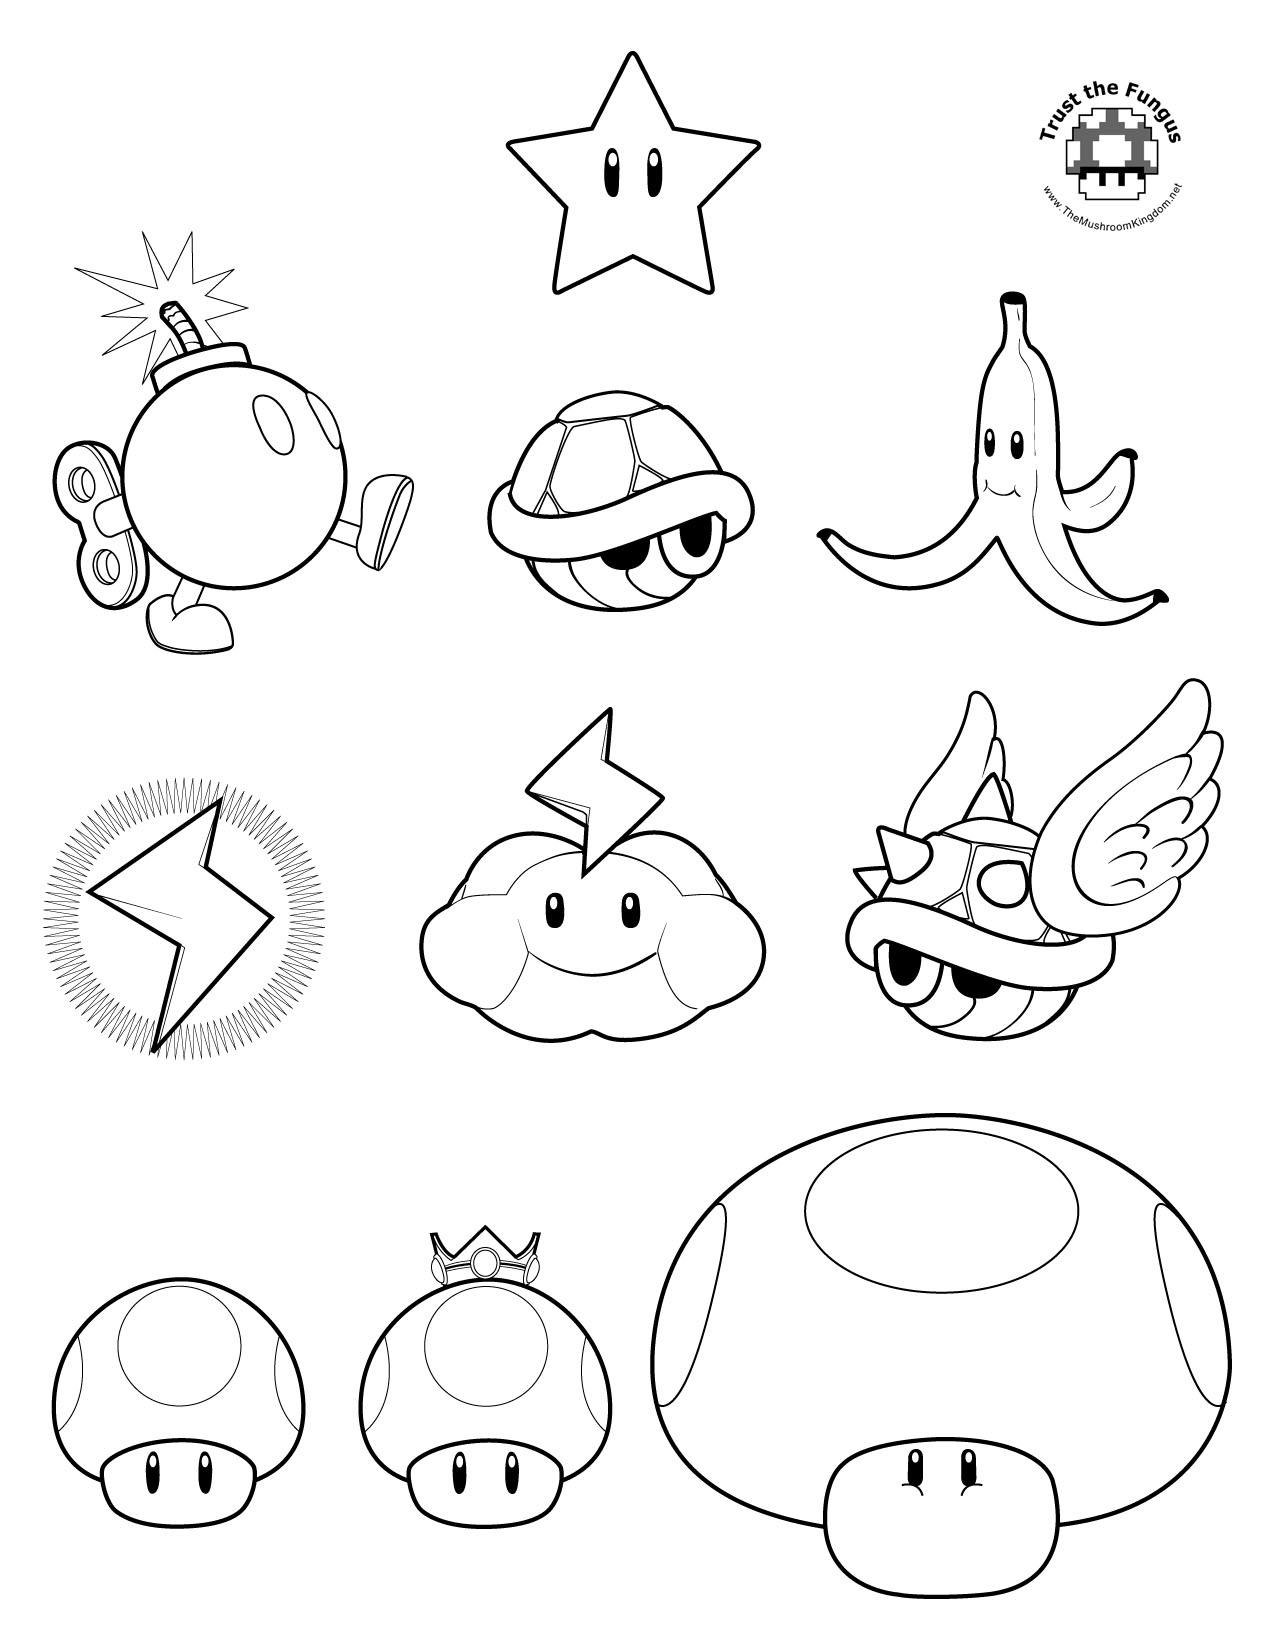 Luxe Dessin A Colorier Mario Bros